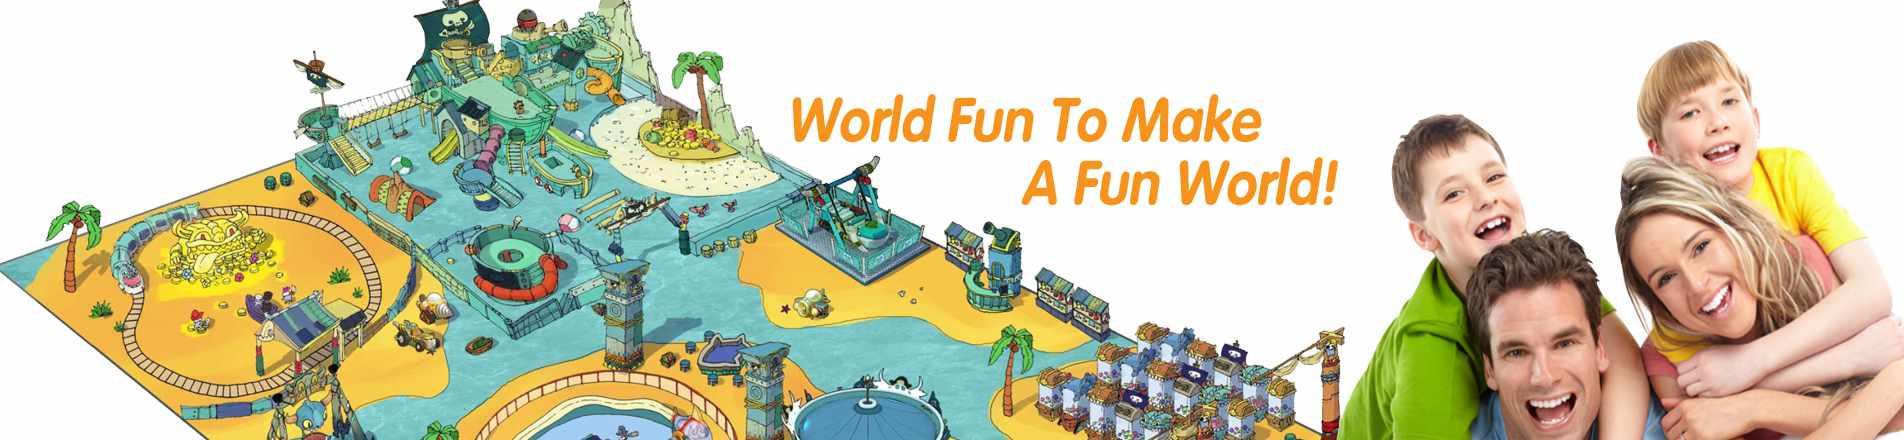 World Fun Attractions